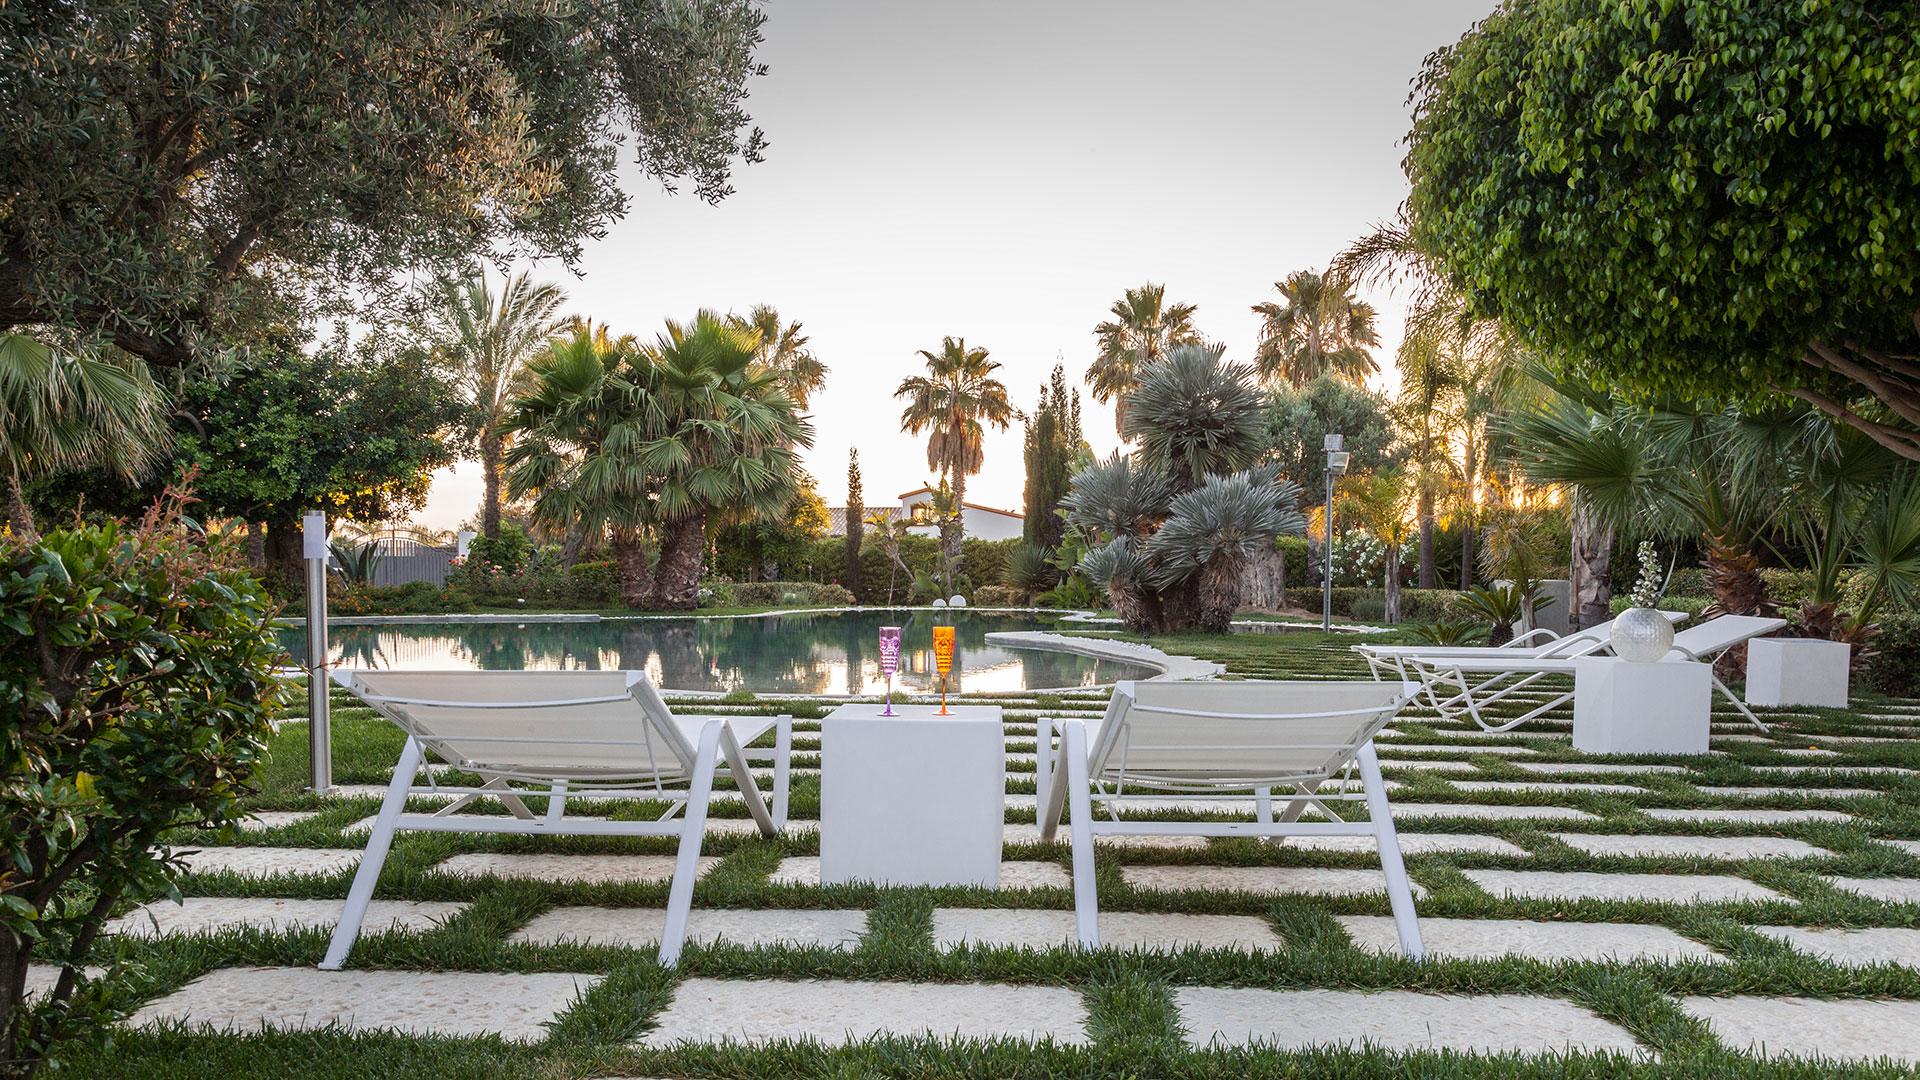 Il giardino degli dei luxury retreat - Il giardino degli dei ...